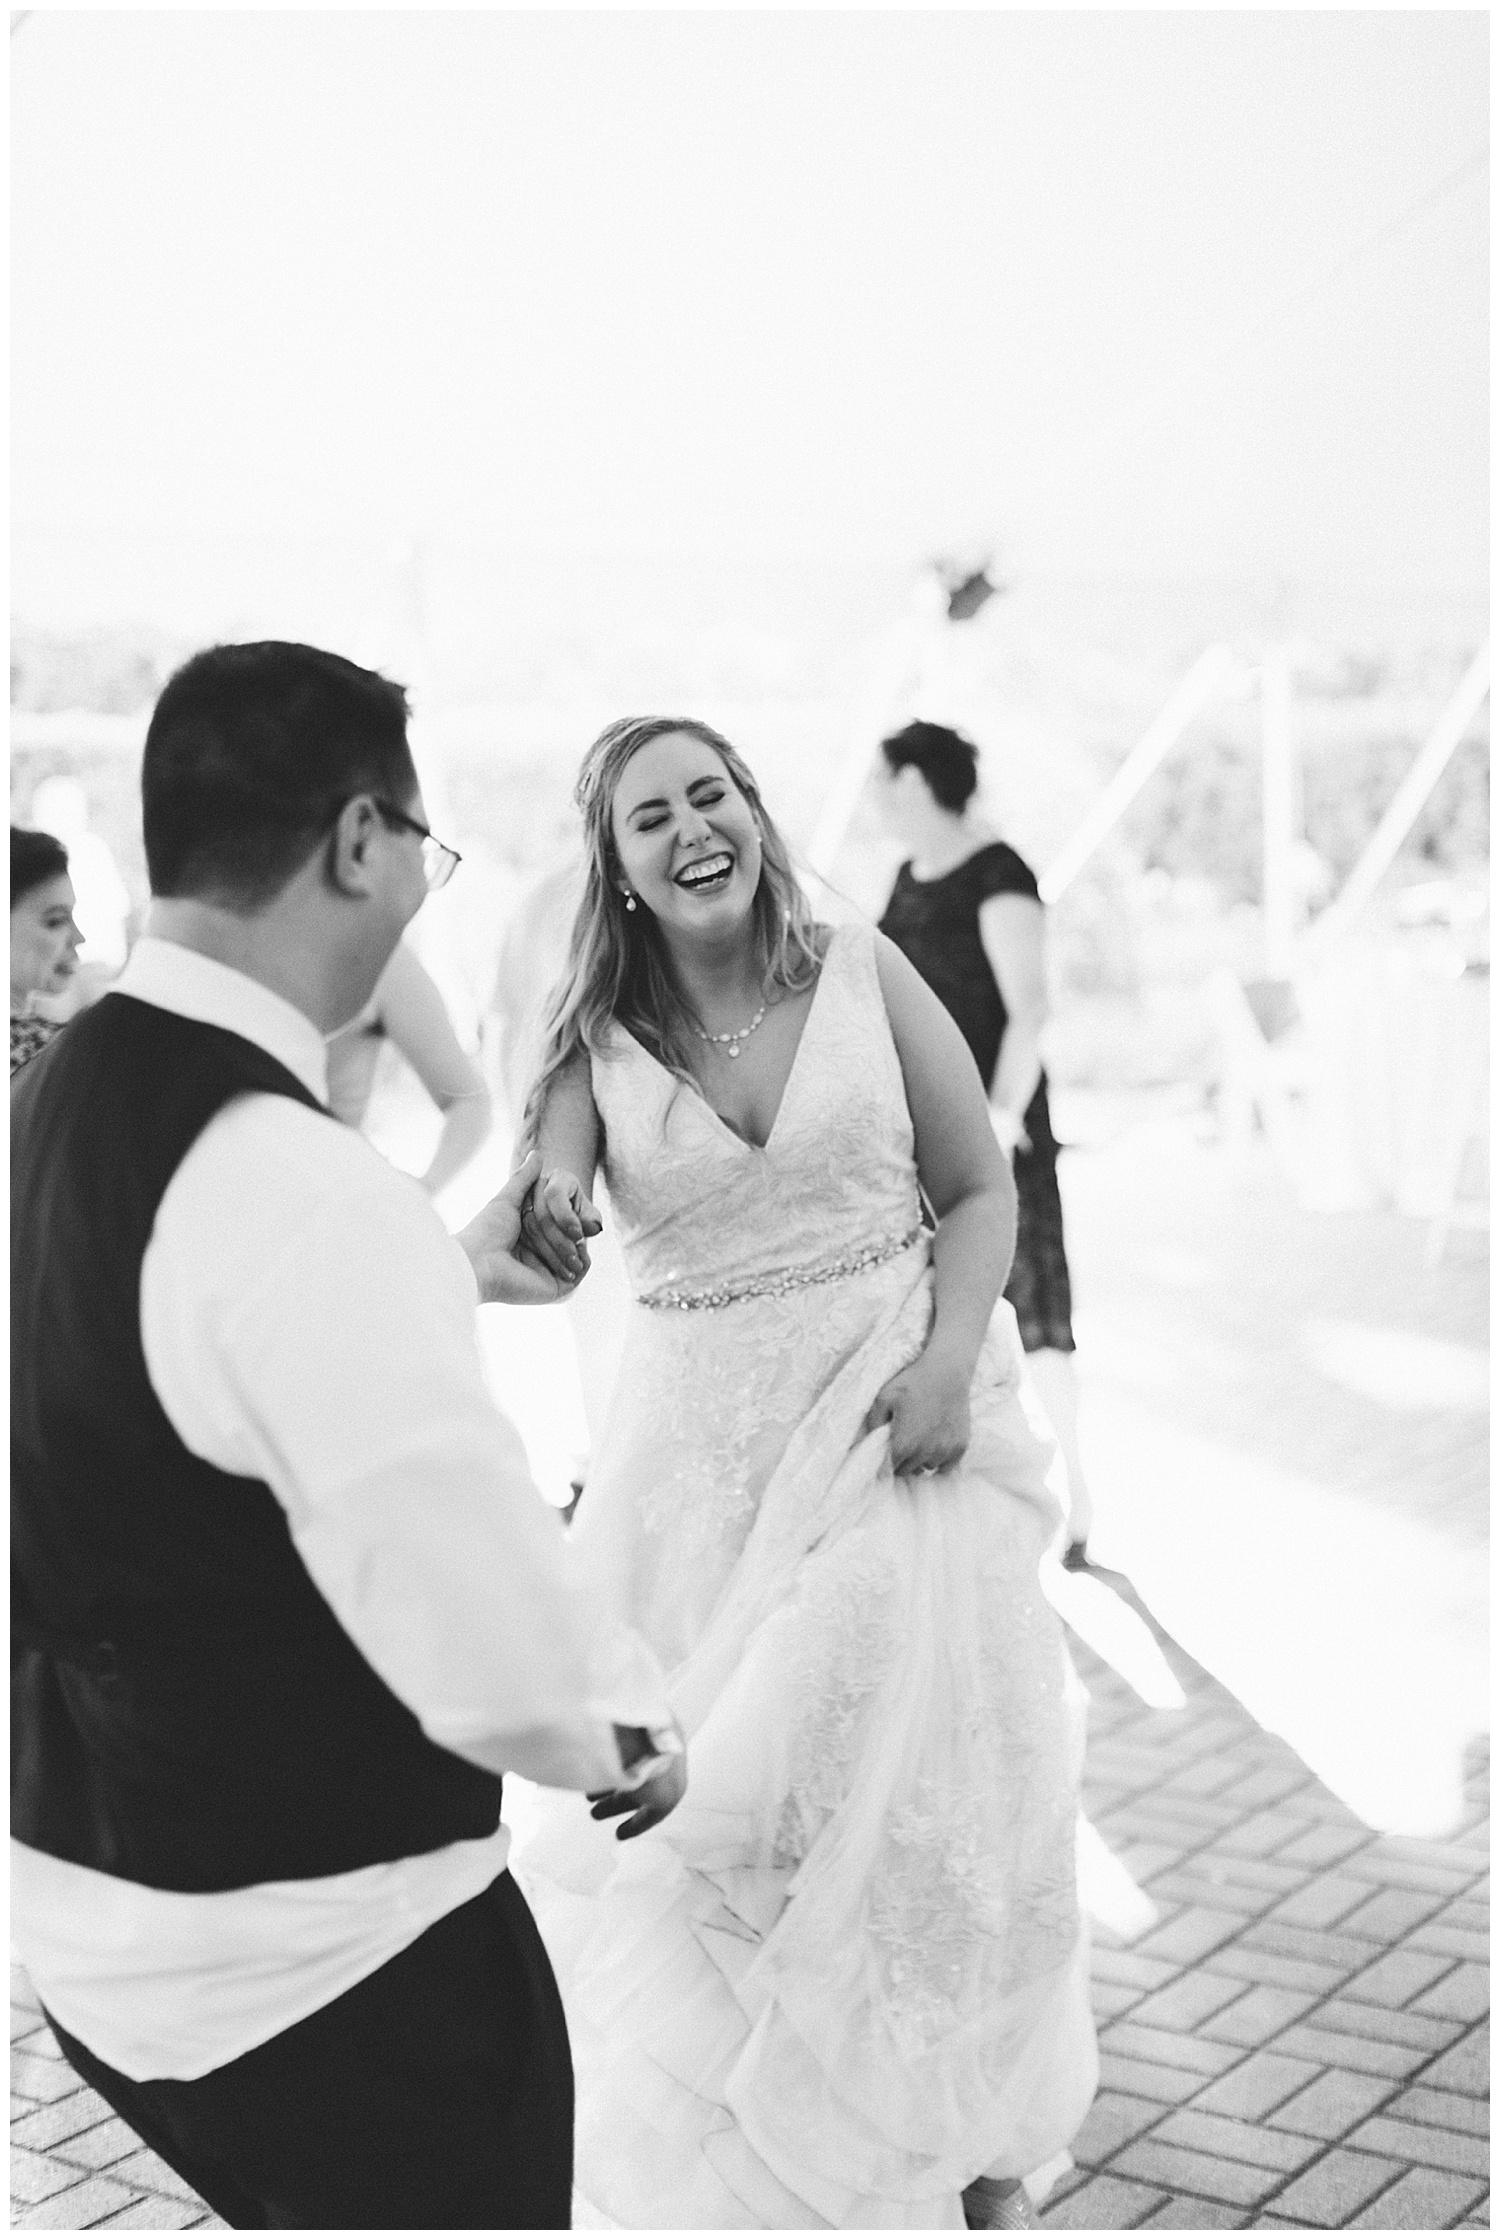 trent.and.kendra.photography.whitehall.wedding-147.jpg